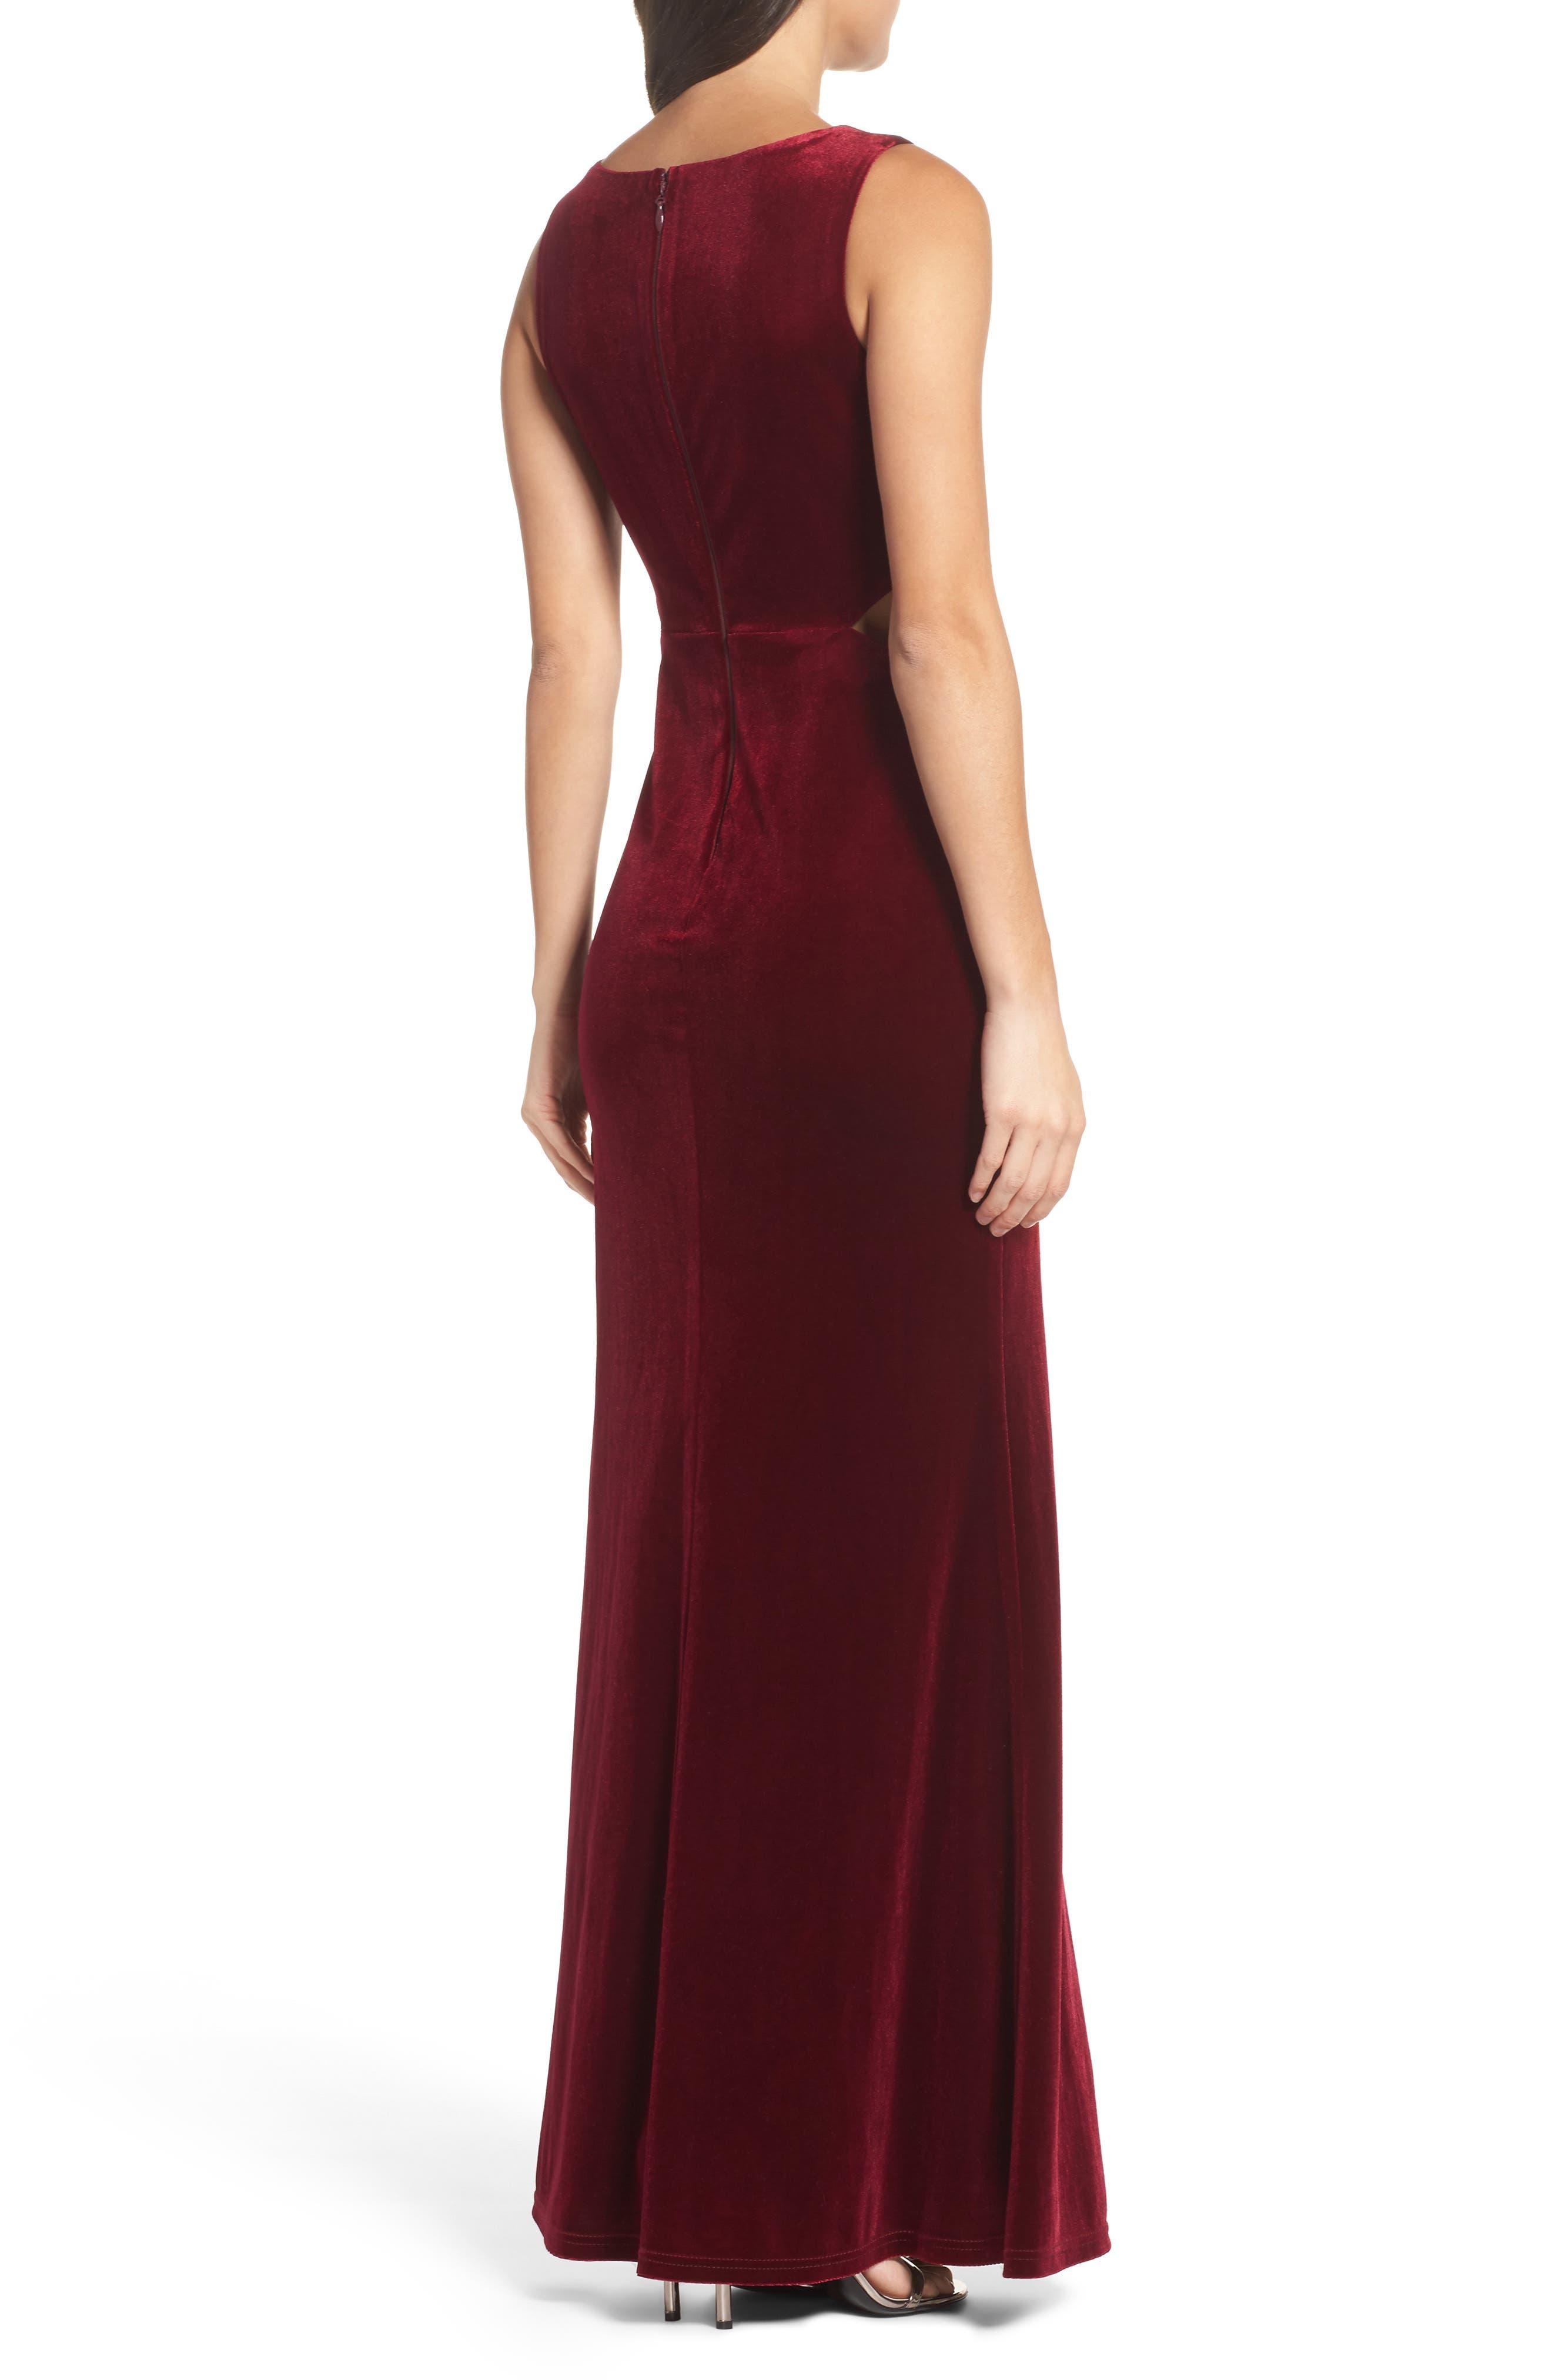 Reach Out Velvet Maxi Dress,                             Alternate thumbnail 2, color,                             Burgundy